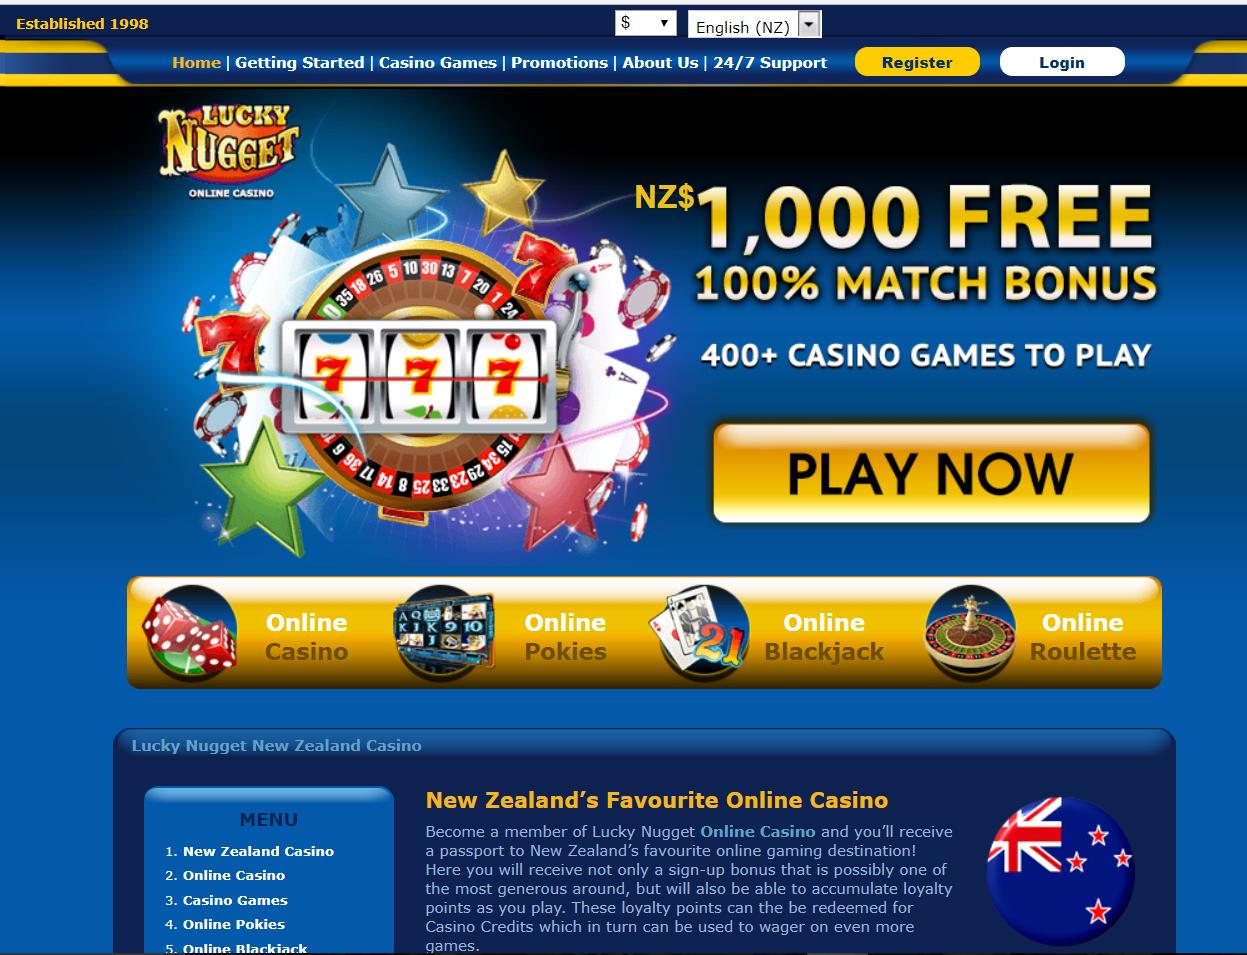 Lucky Nugget casino avis : analyse et avis de cette plateforme !